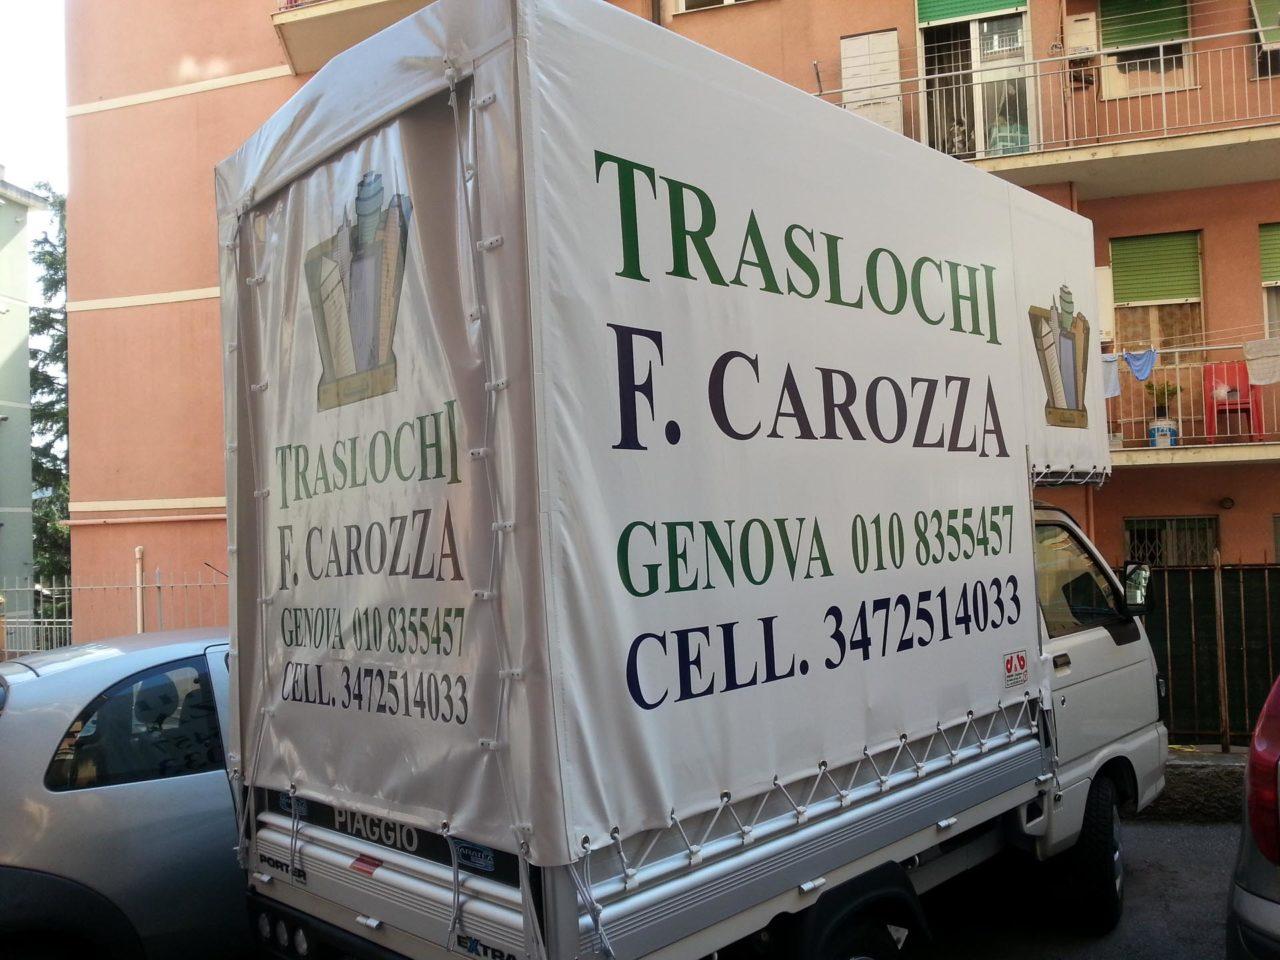 Traslochi Carozza Fiorenzo Genova-49